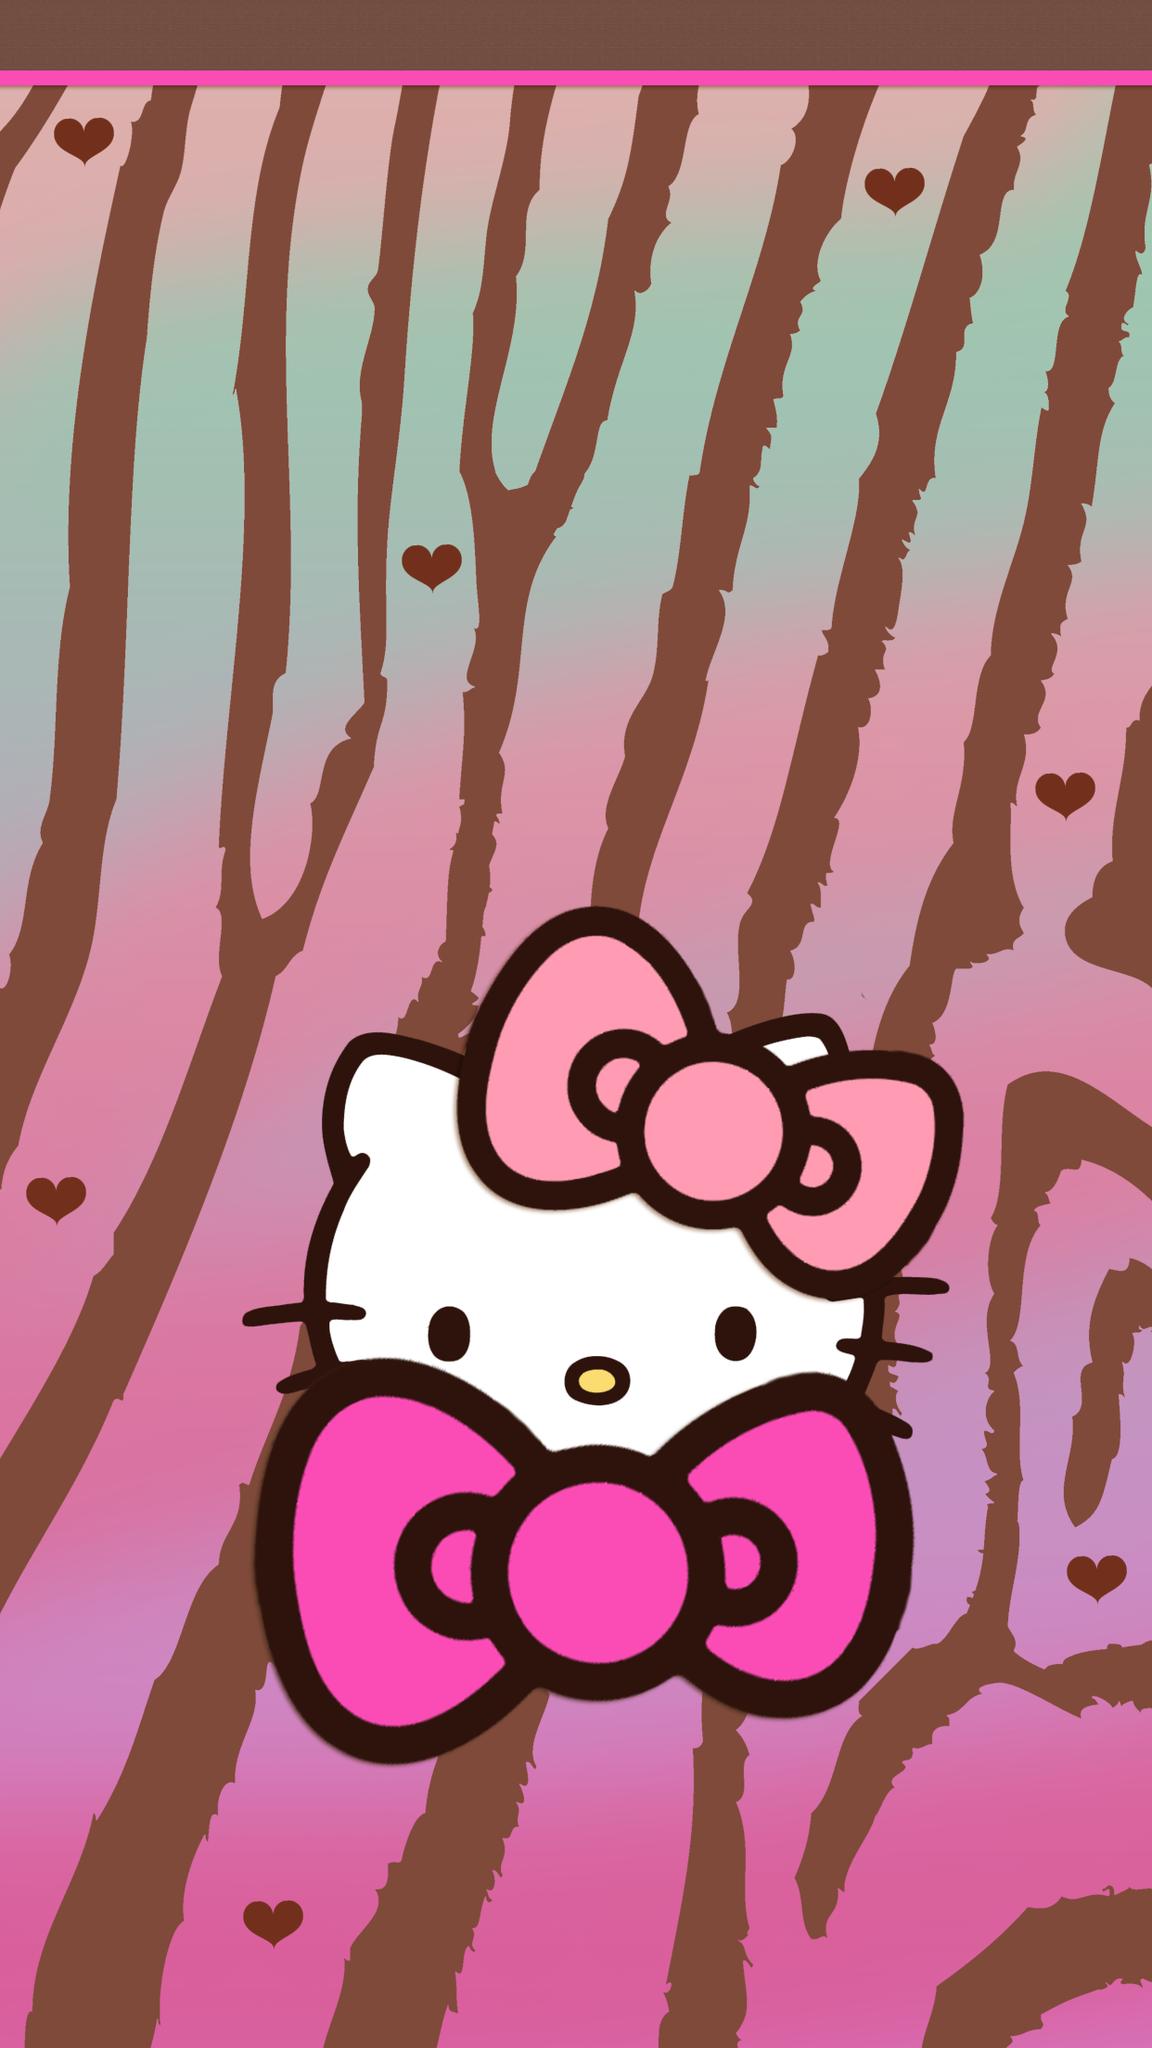 Best Wallpaper Hello Kitty Leopard Print - 5f875b591377ebbca9b3de67fad39853  Picture_542182.png